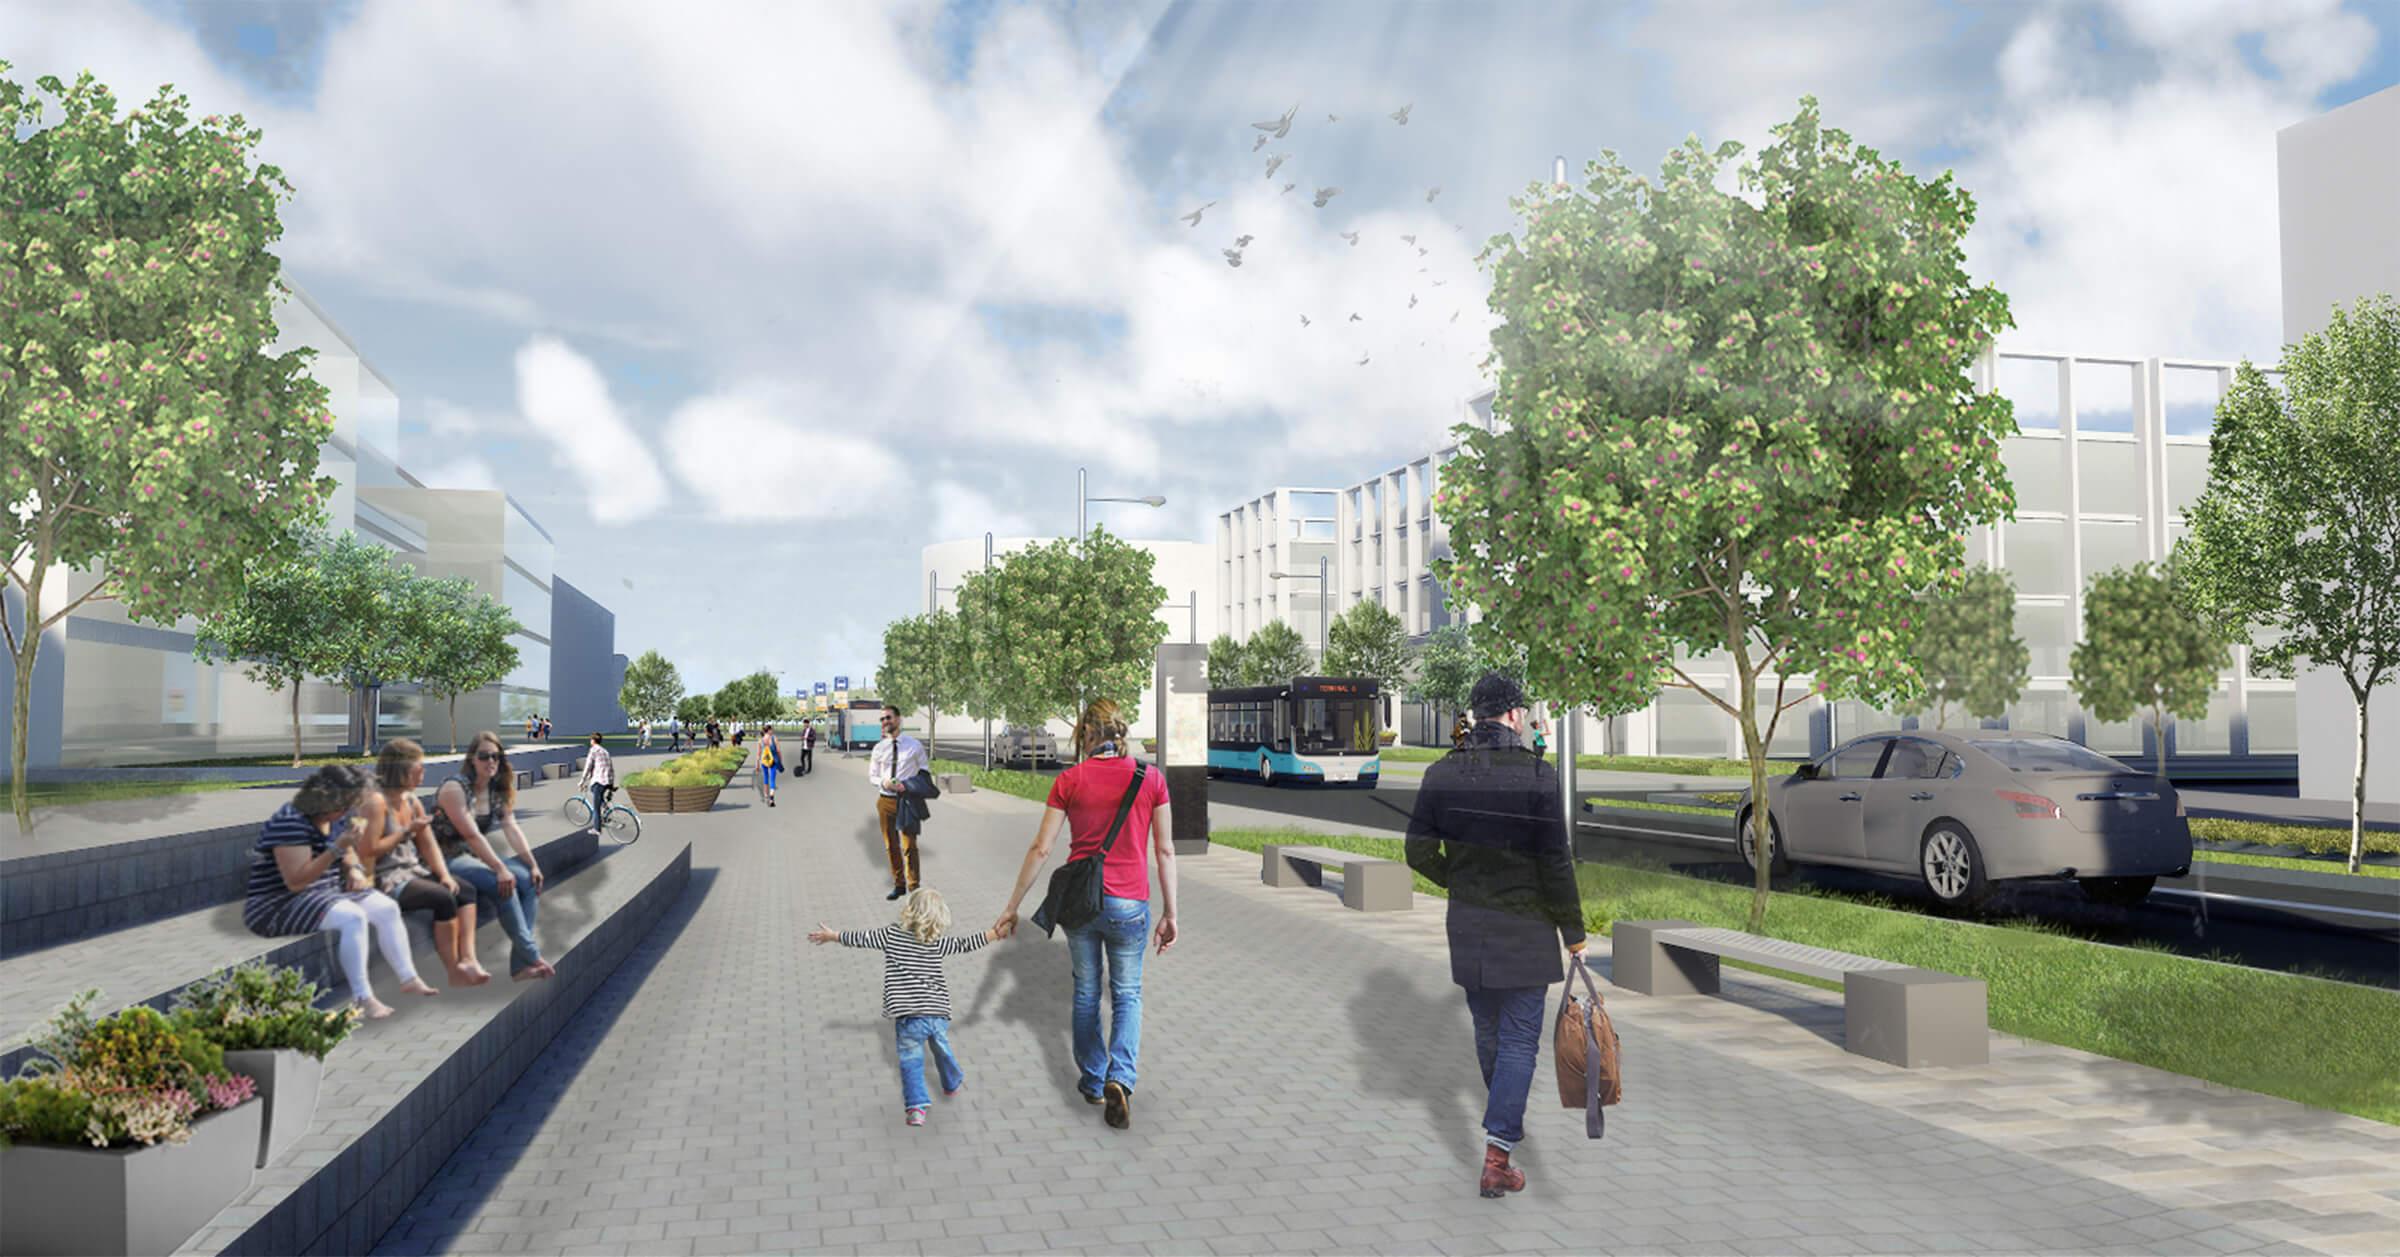 Concept-art-of-Ravenscraig-redevelopment